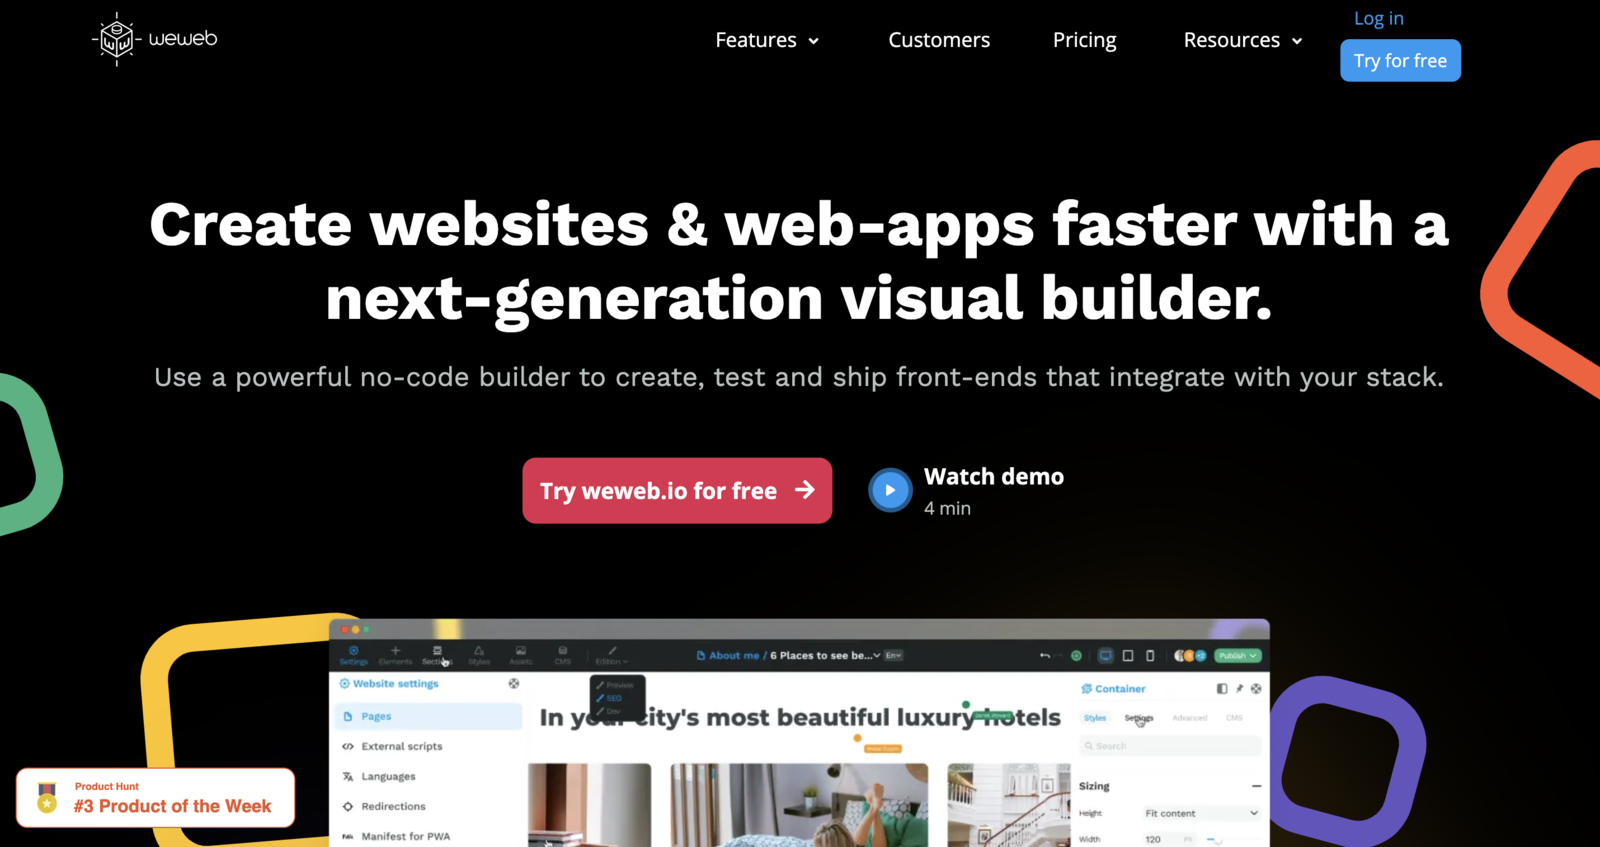 The weweb website